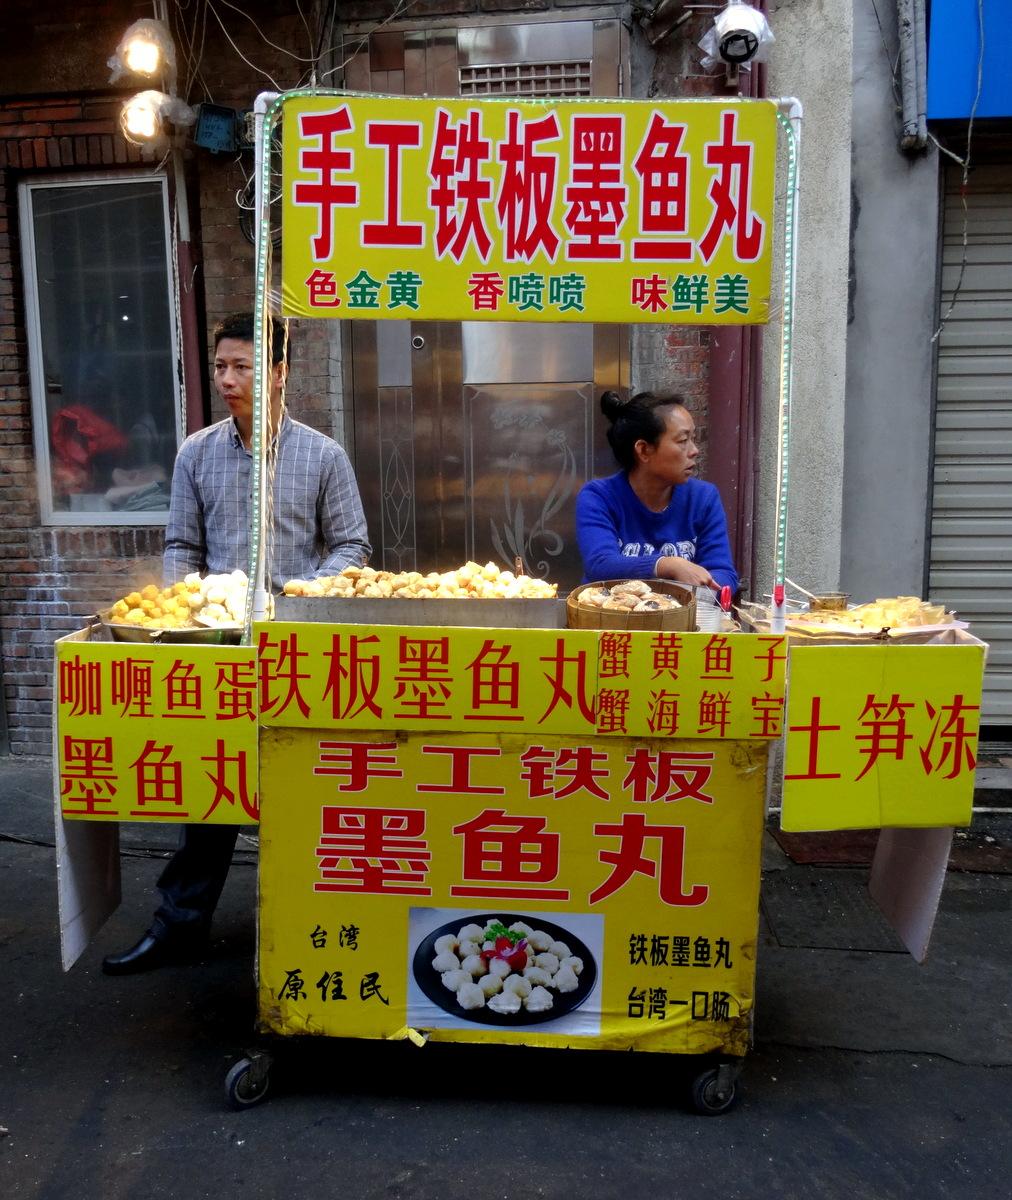 Street Food Scene on Longtou Road (Dragon Head Road